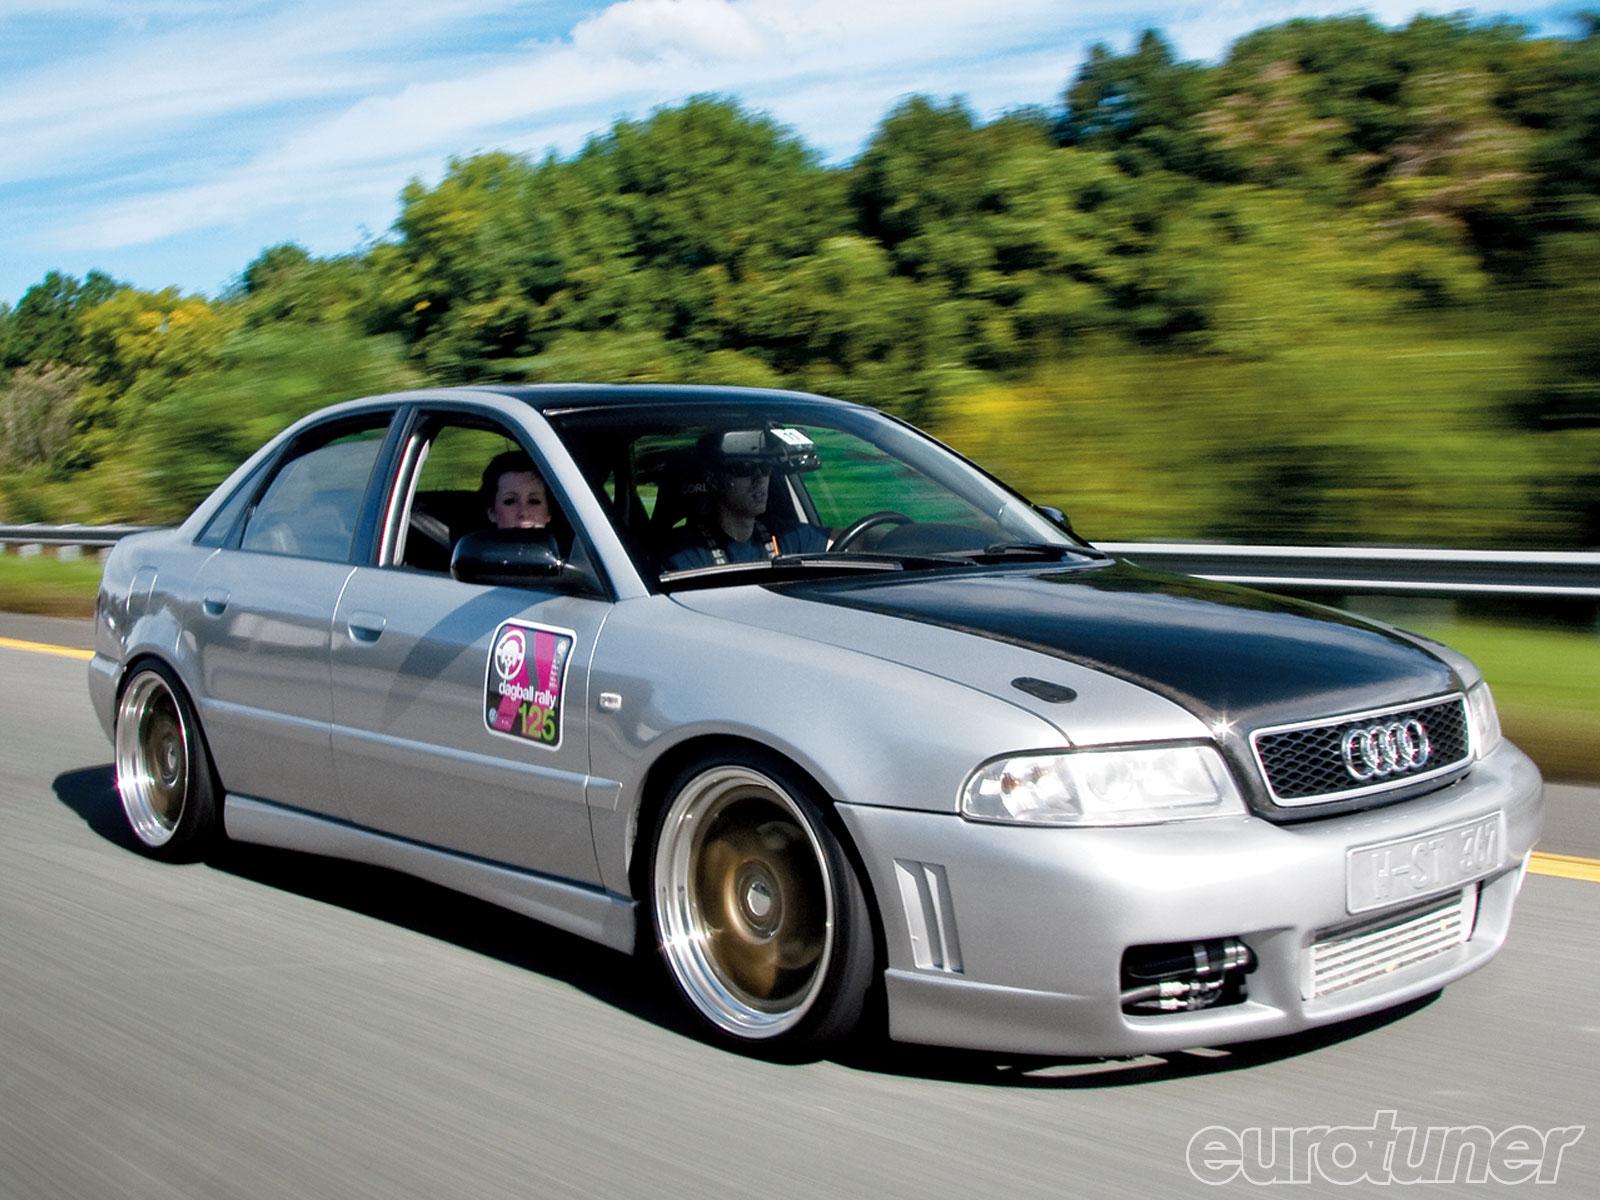 2005 Audi S4 Image 17